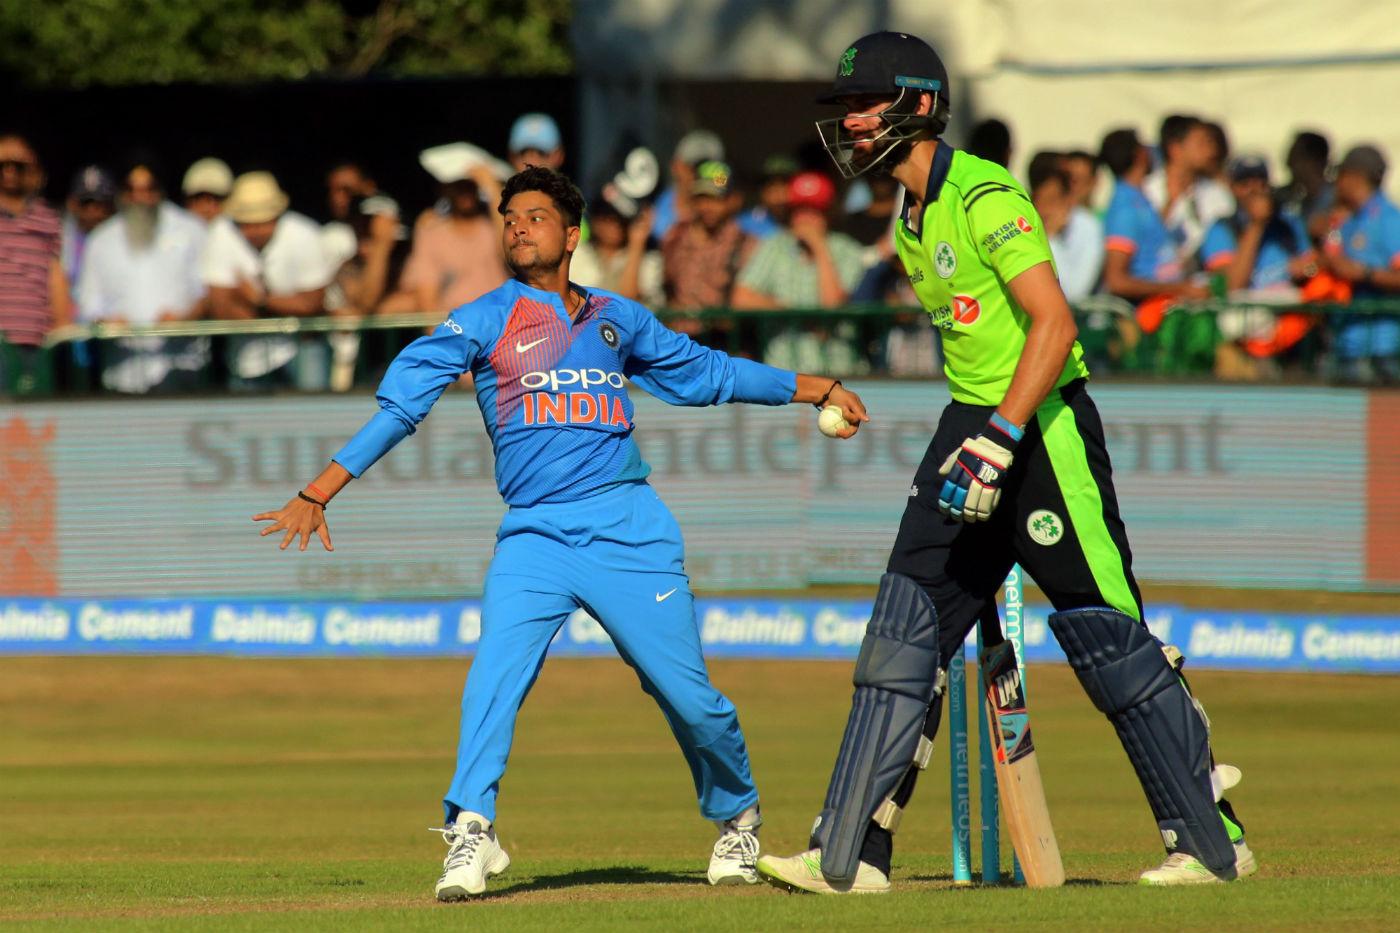 Ireland Vs India, 2018: 1st T20I, Dublin – Statistical Highlights